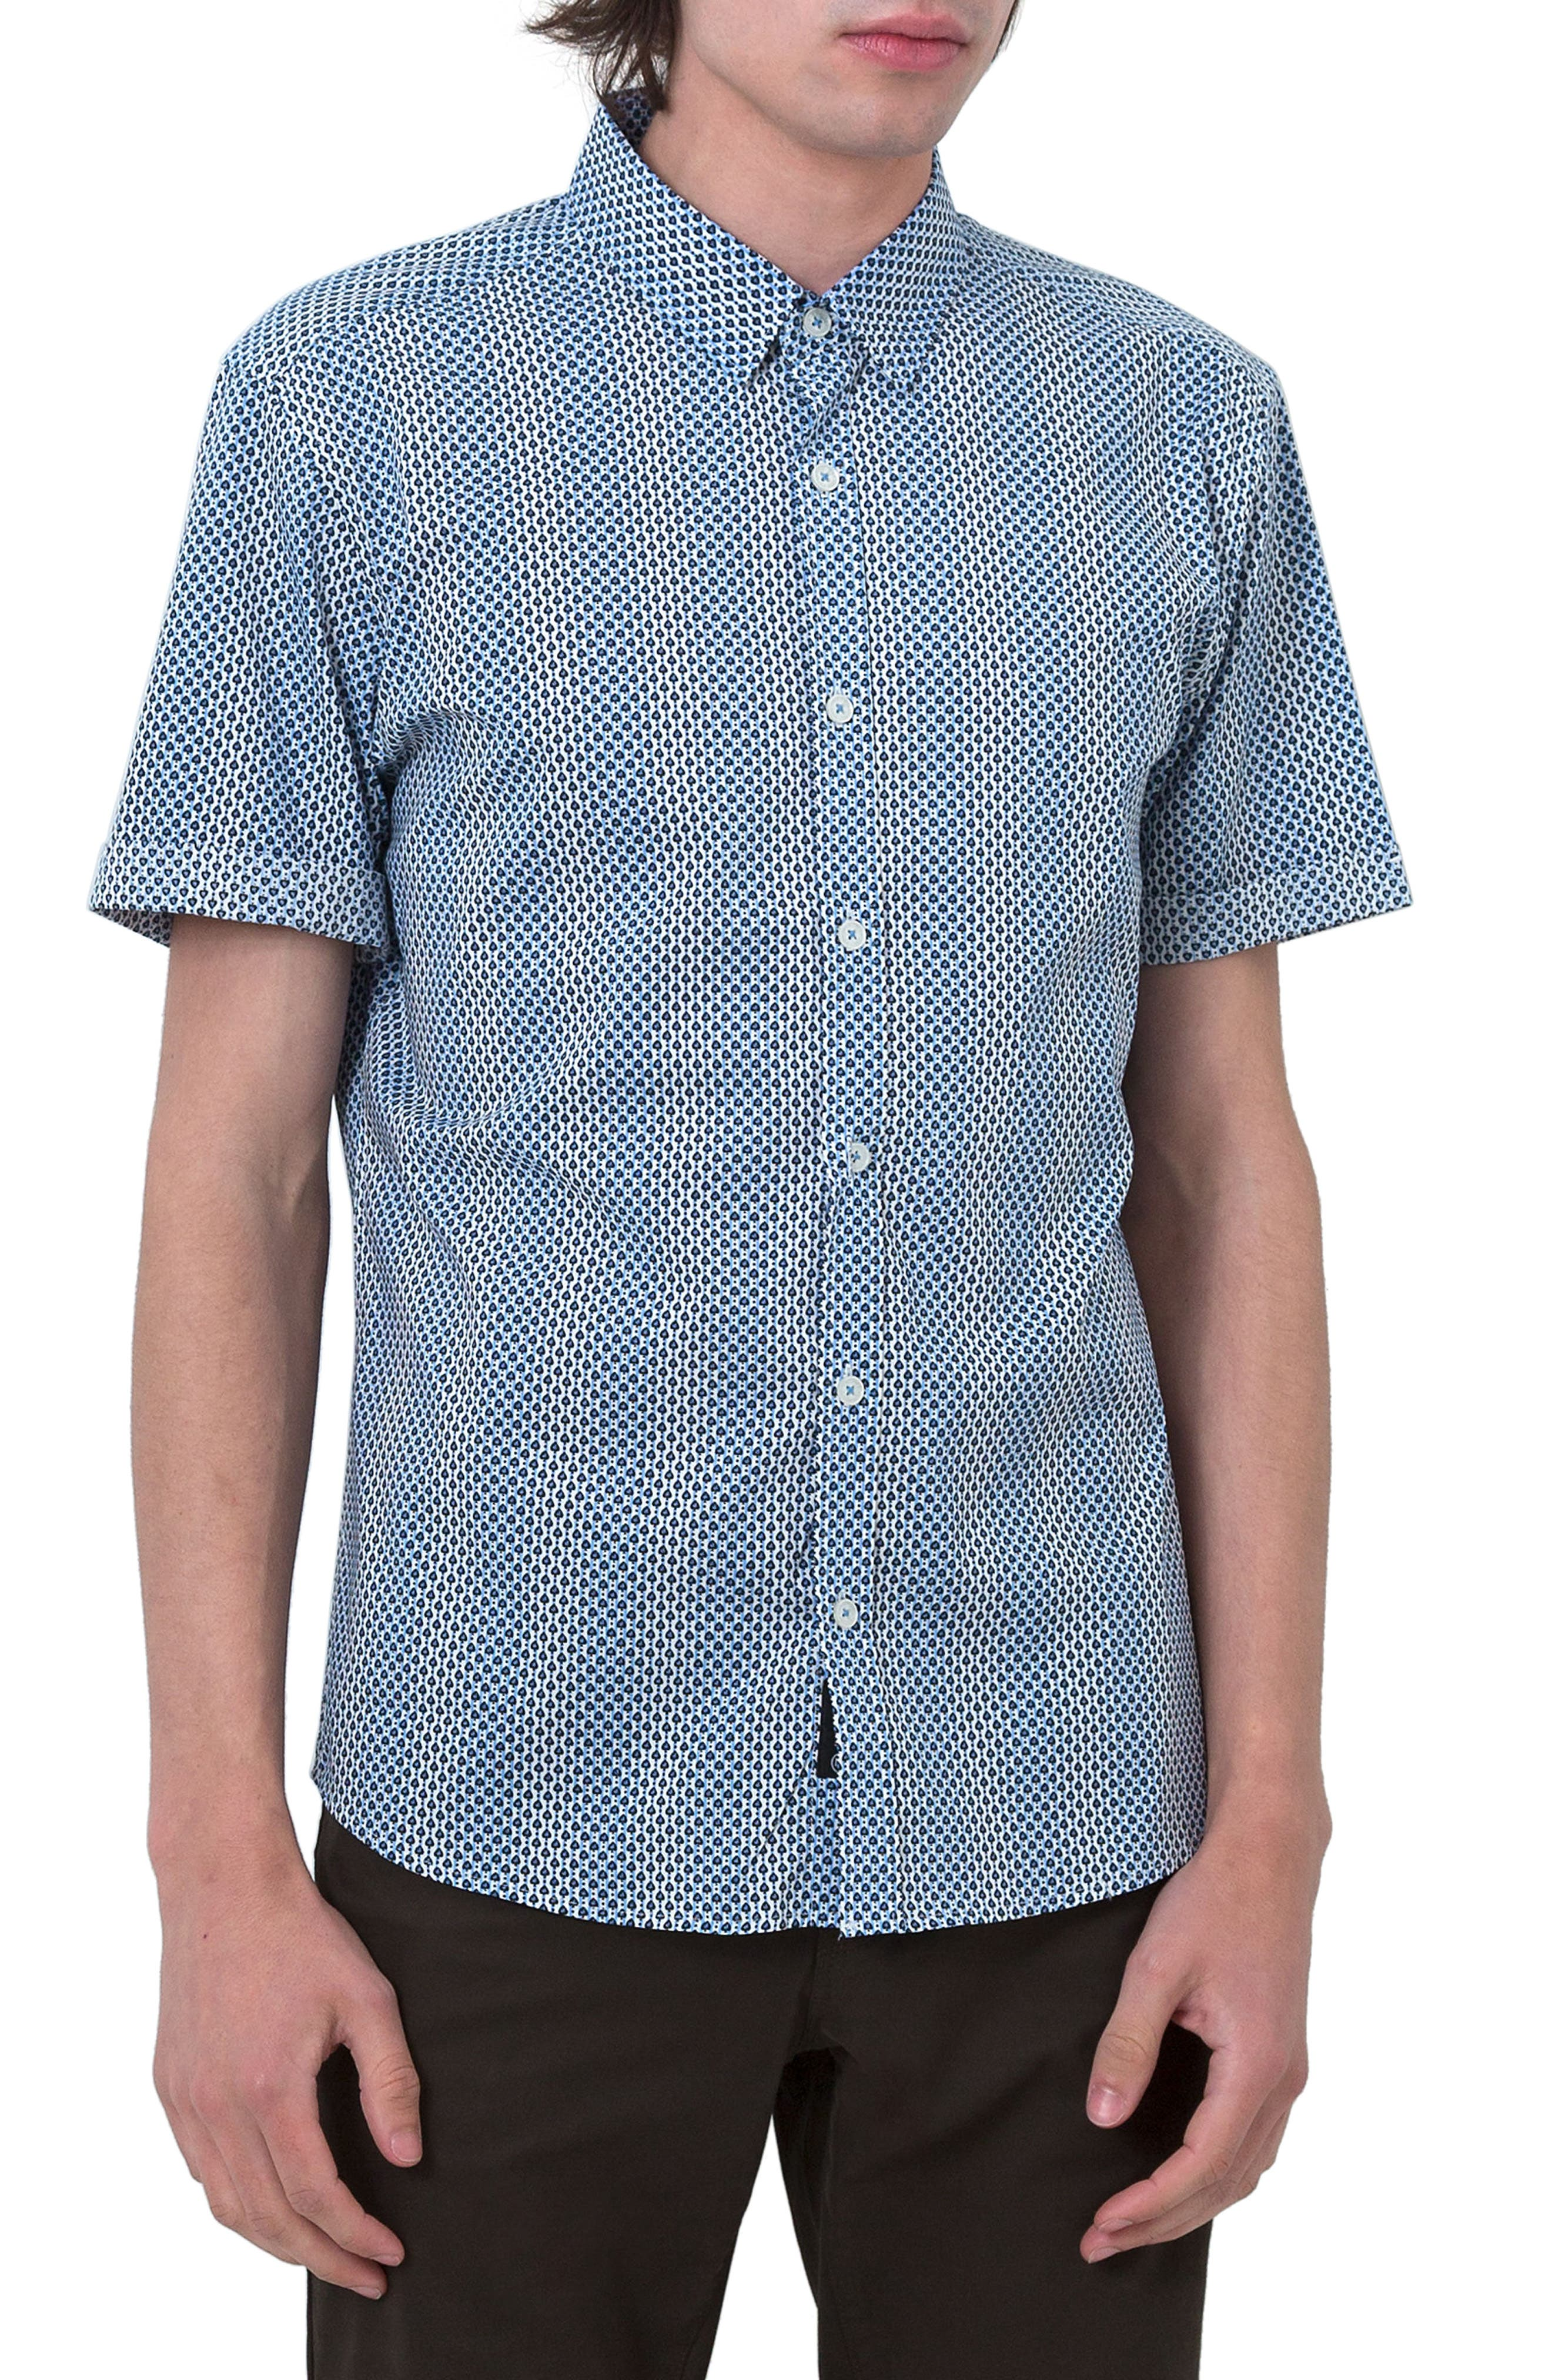 Goodnight Sun Woven Shirt,                         Main,                         color, 400